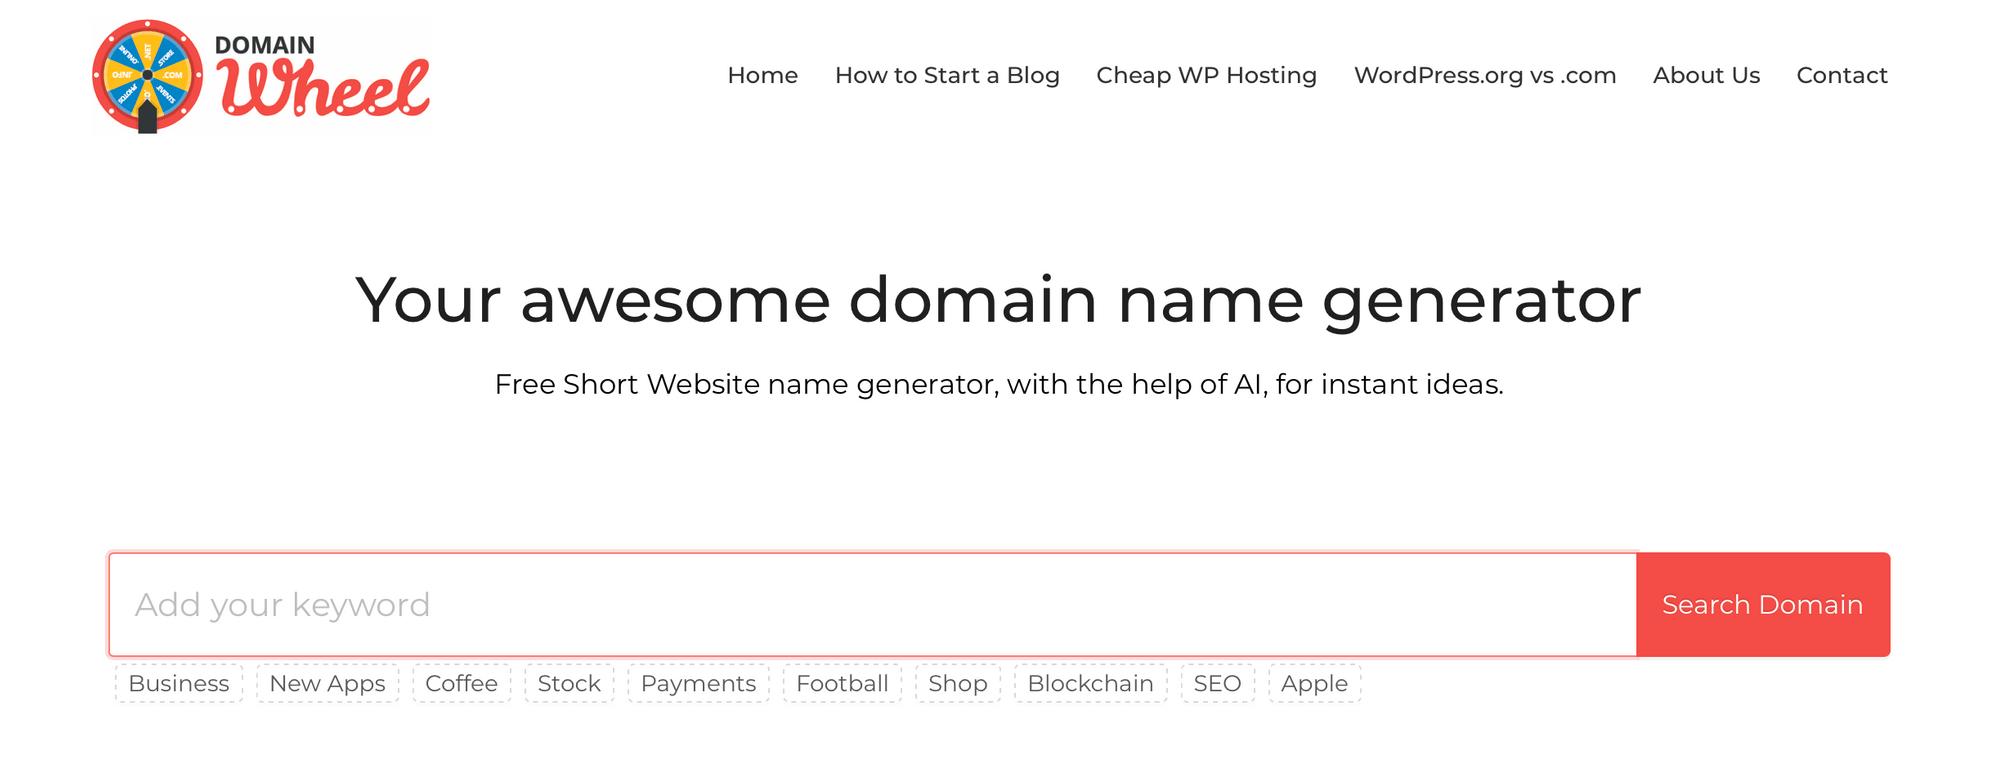 Domain Wheel网站。